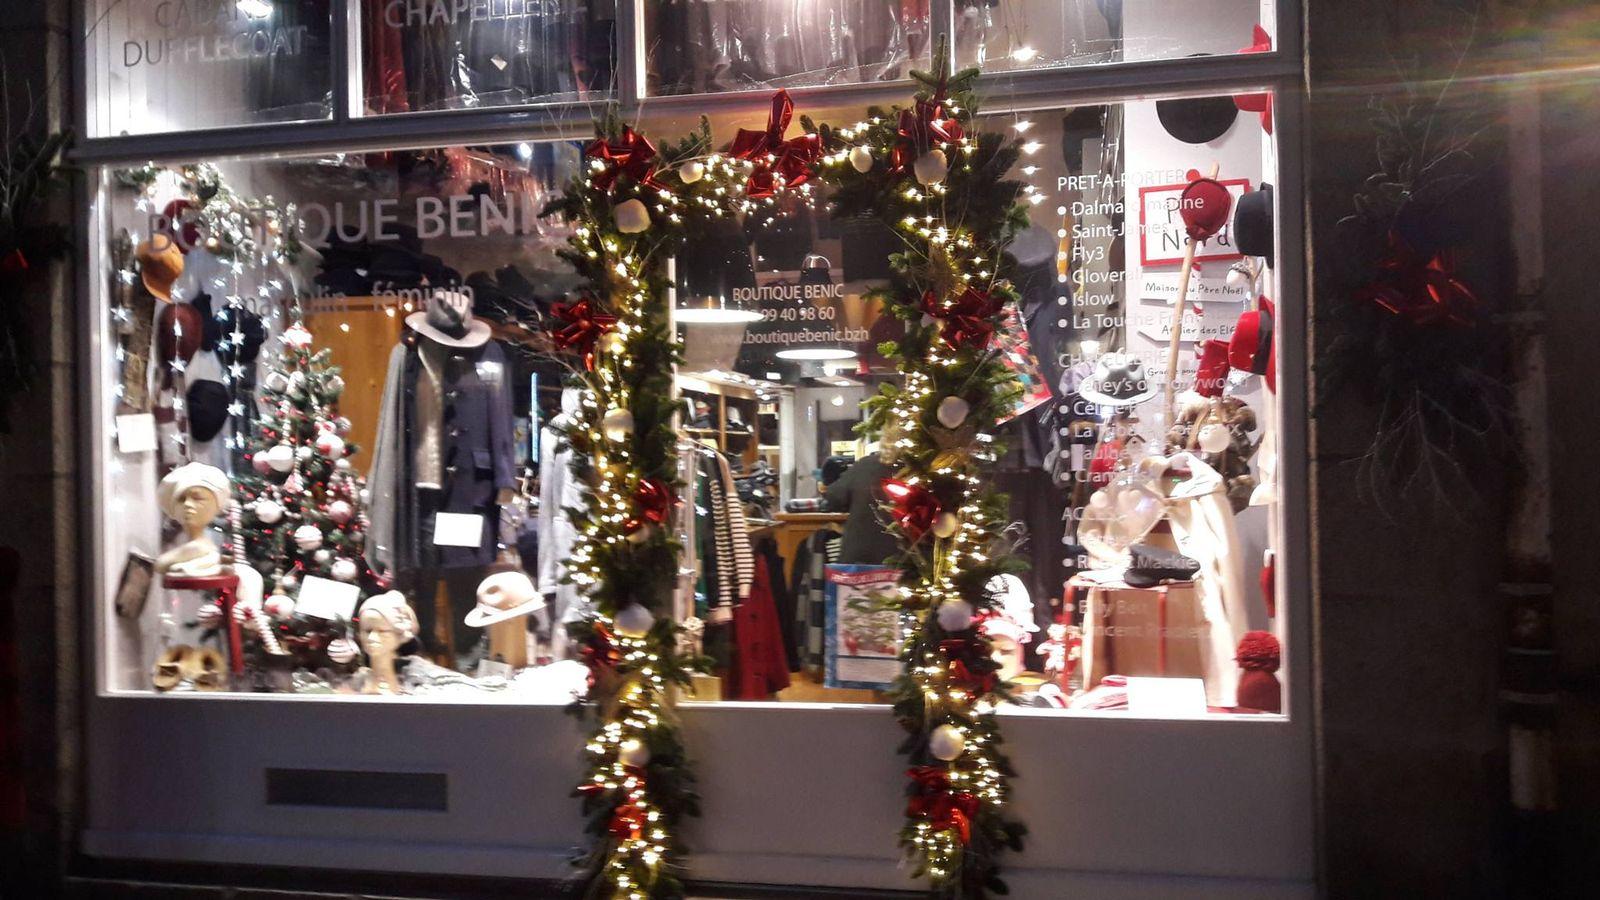 Image Vitrine Noel.Vitrine De Noel Boutique Benic Saint Malo Intra Muros